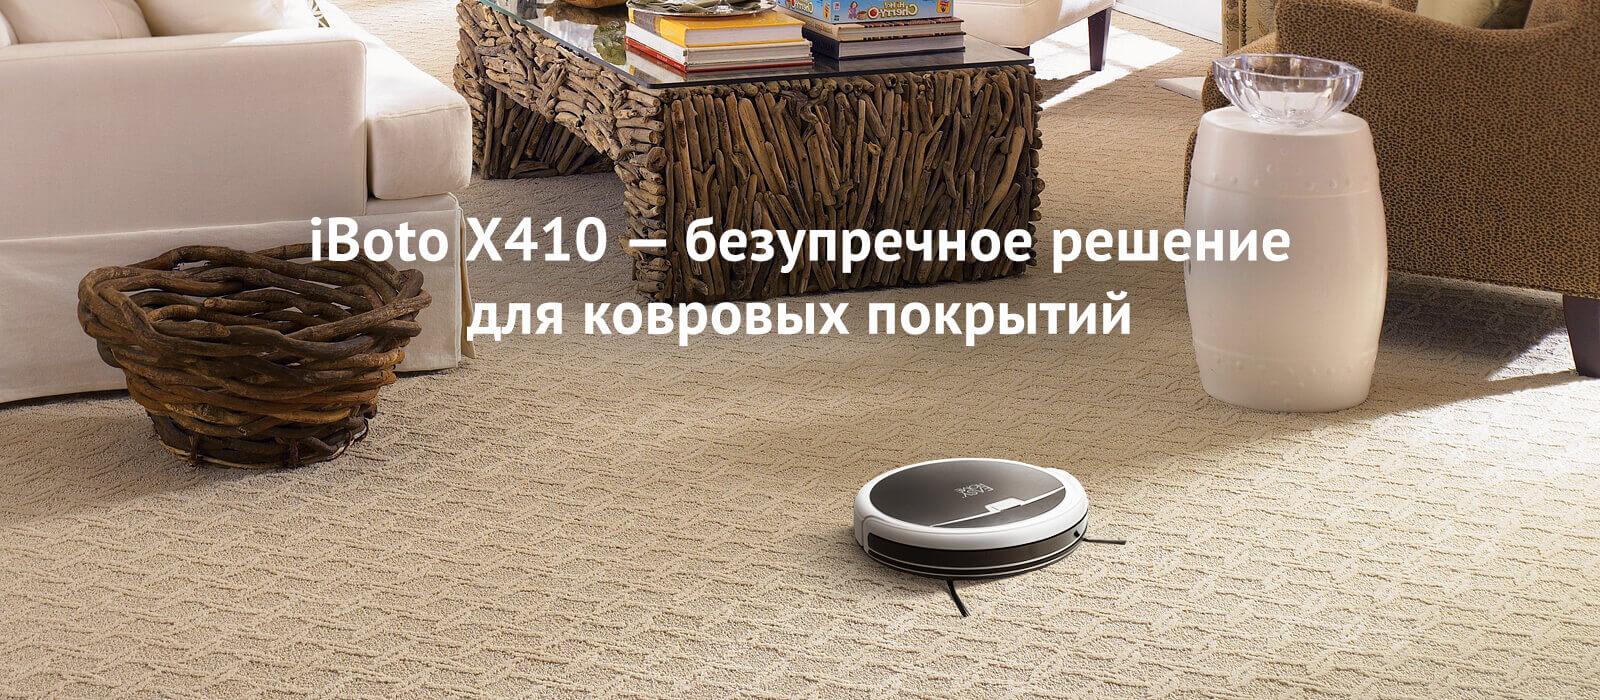 Робот iBoto